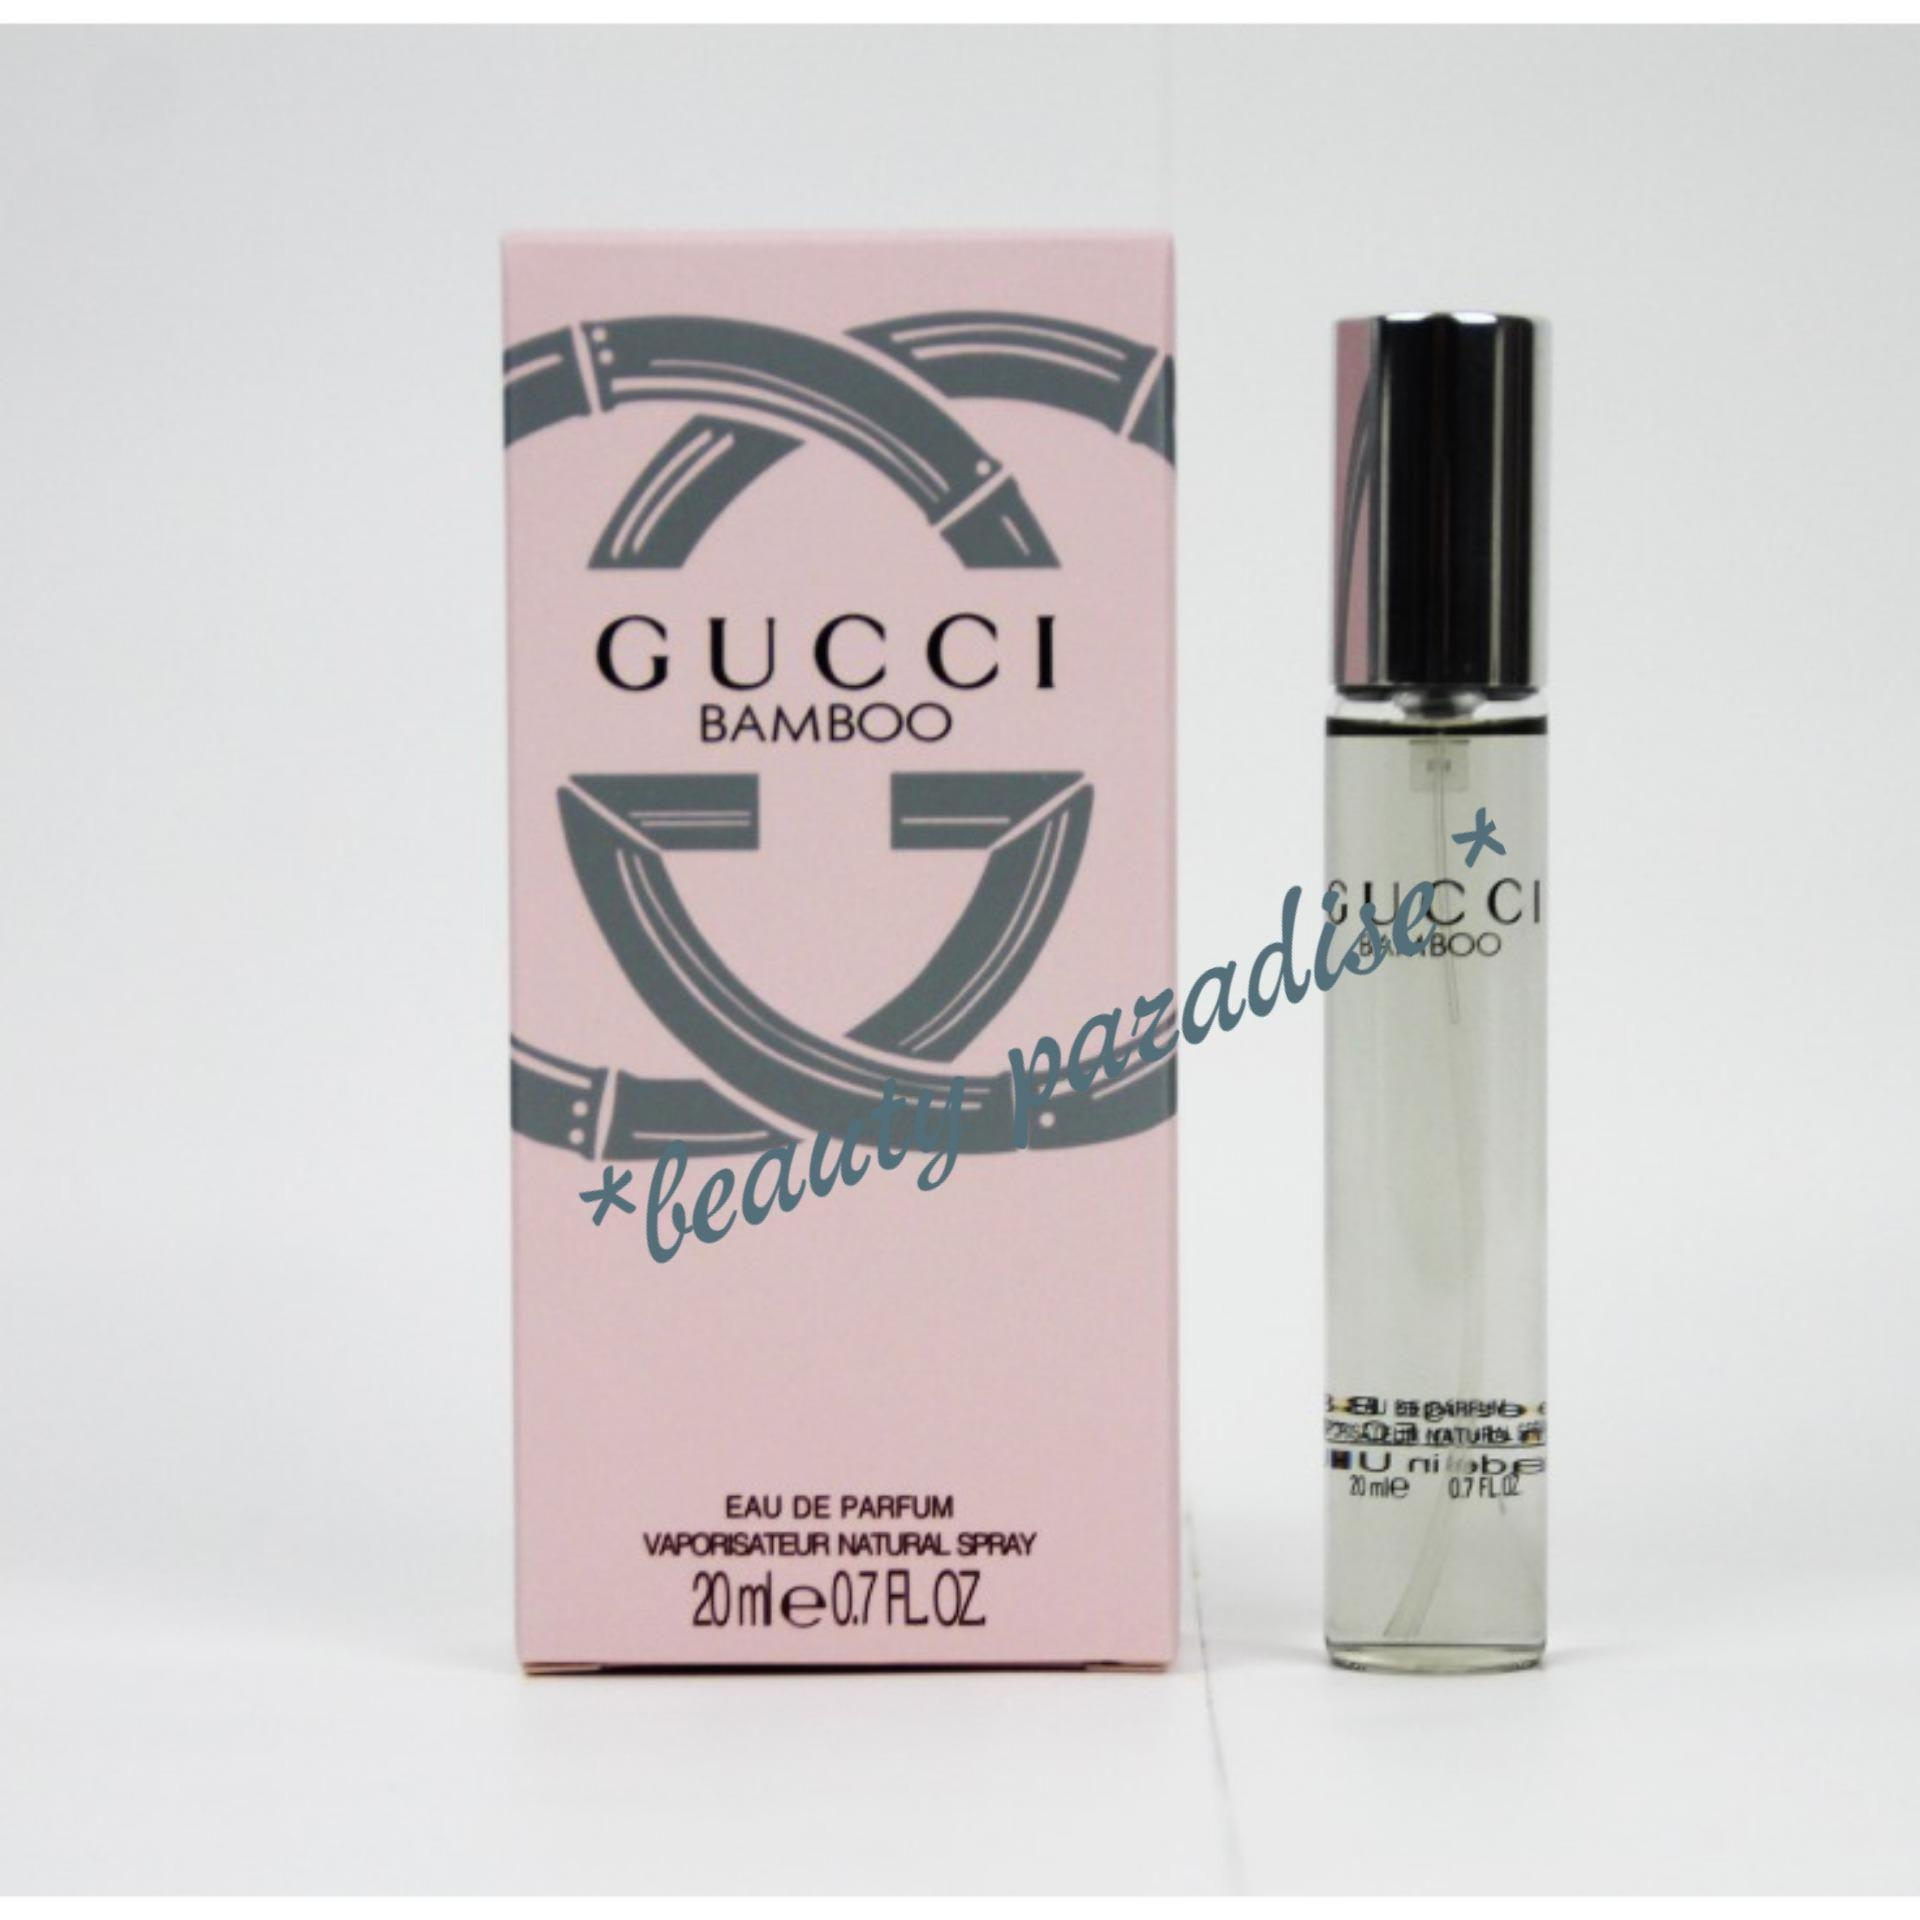 Latest Gucci Fragrances Products Enjoy Huge Discounts Lazada Sg Bamboo Edp 75ml Women Purse Perfume